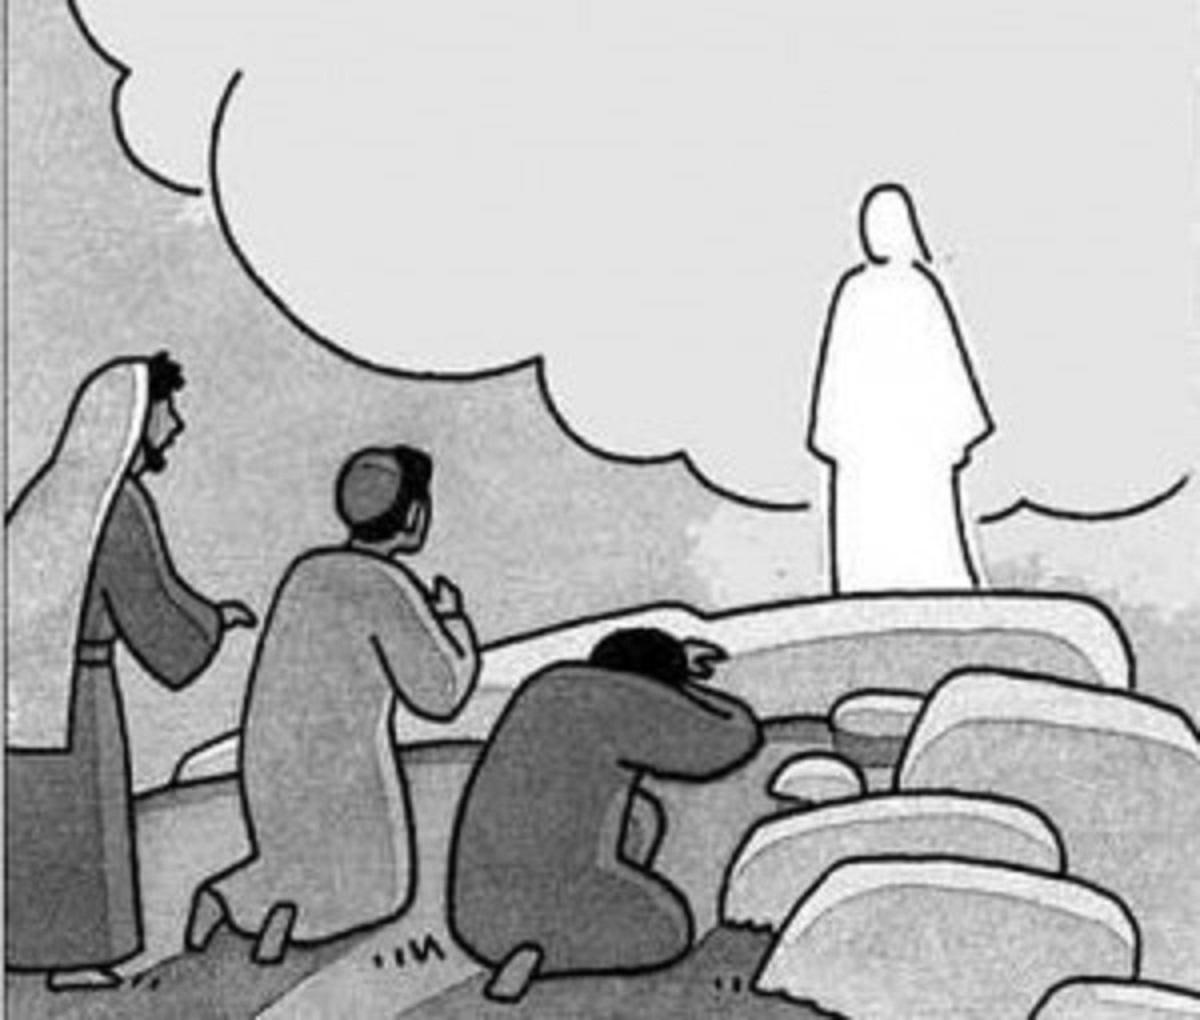 Transfiguration de Jésus 2015 7.jpg